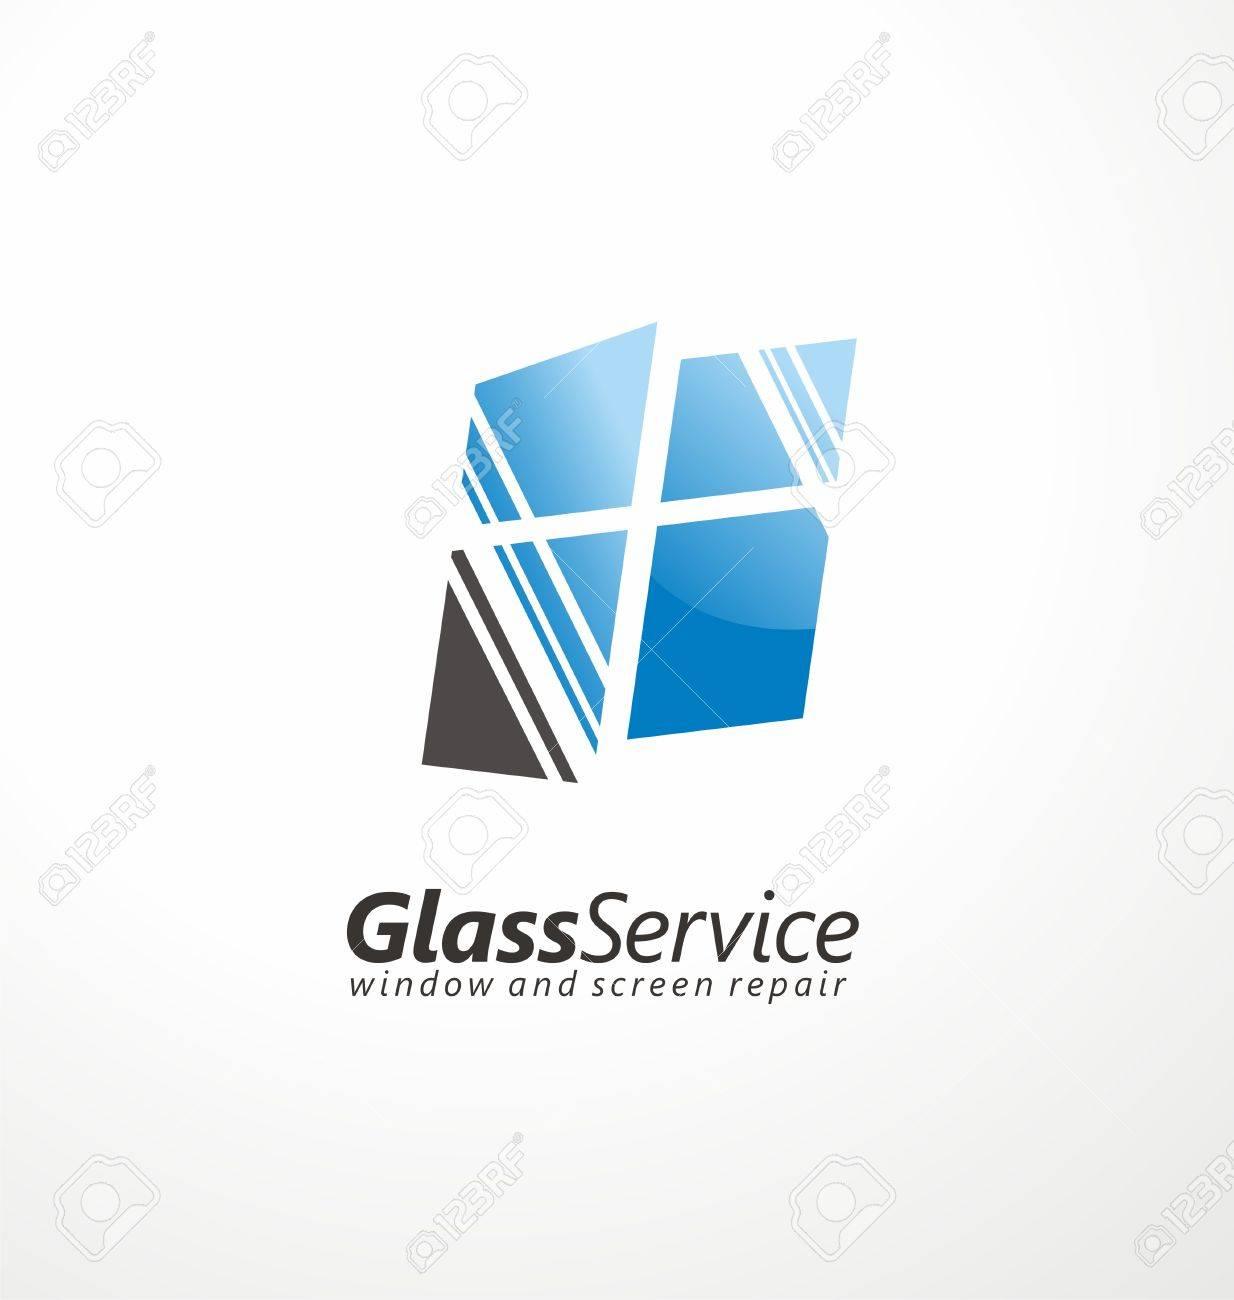 Glass service symbol layout - 50937537